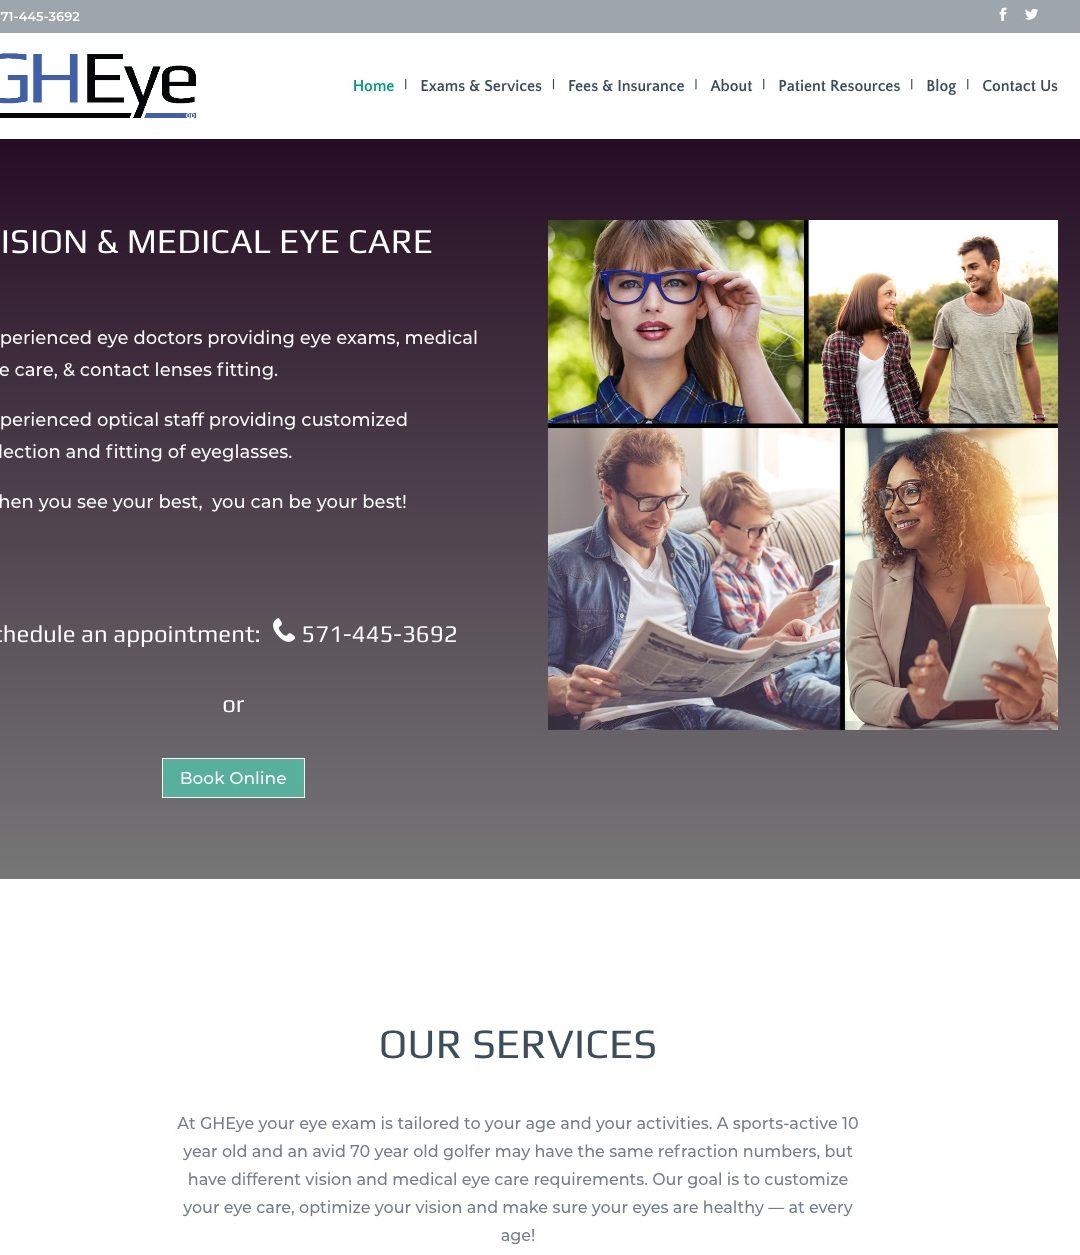 GHEye Vision & Medical Eye Care